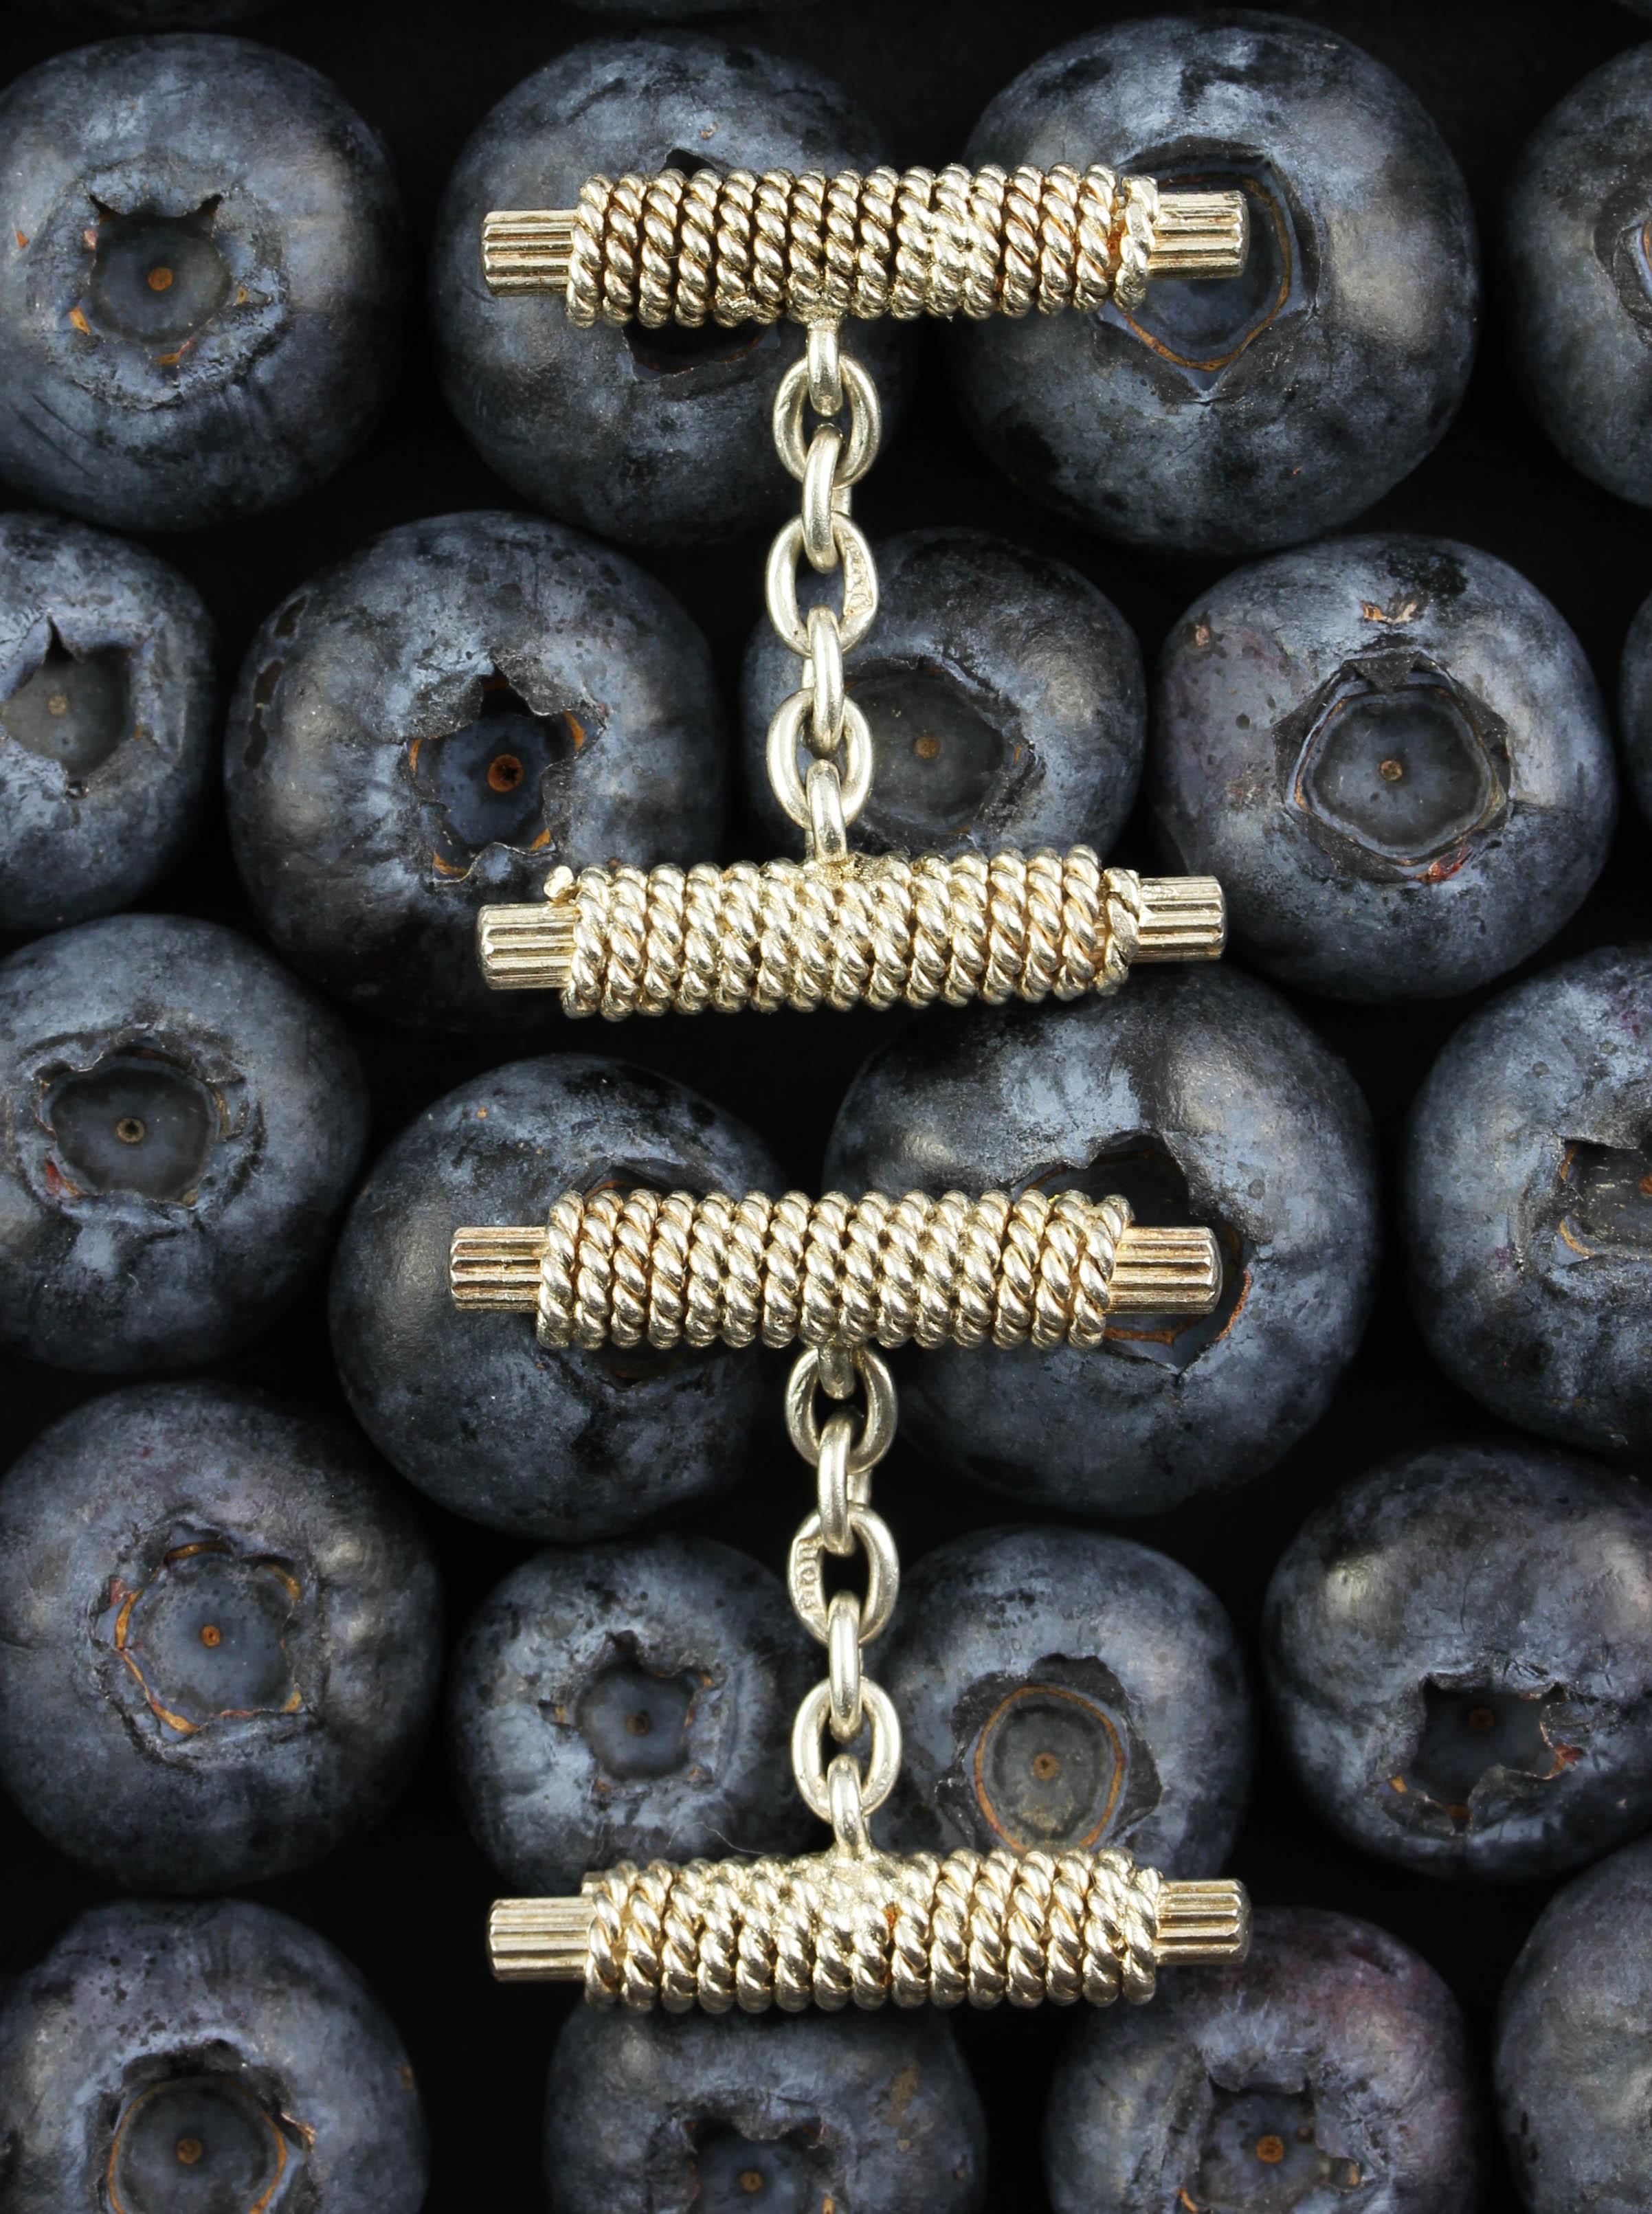 Double bar chain linked cufflinks